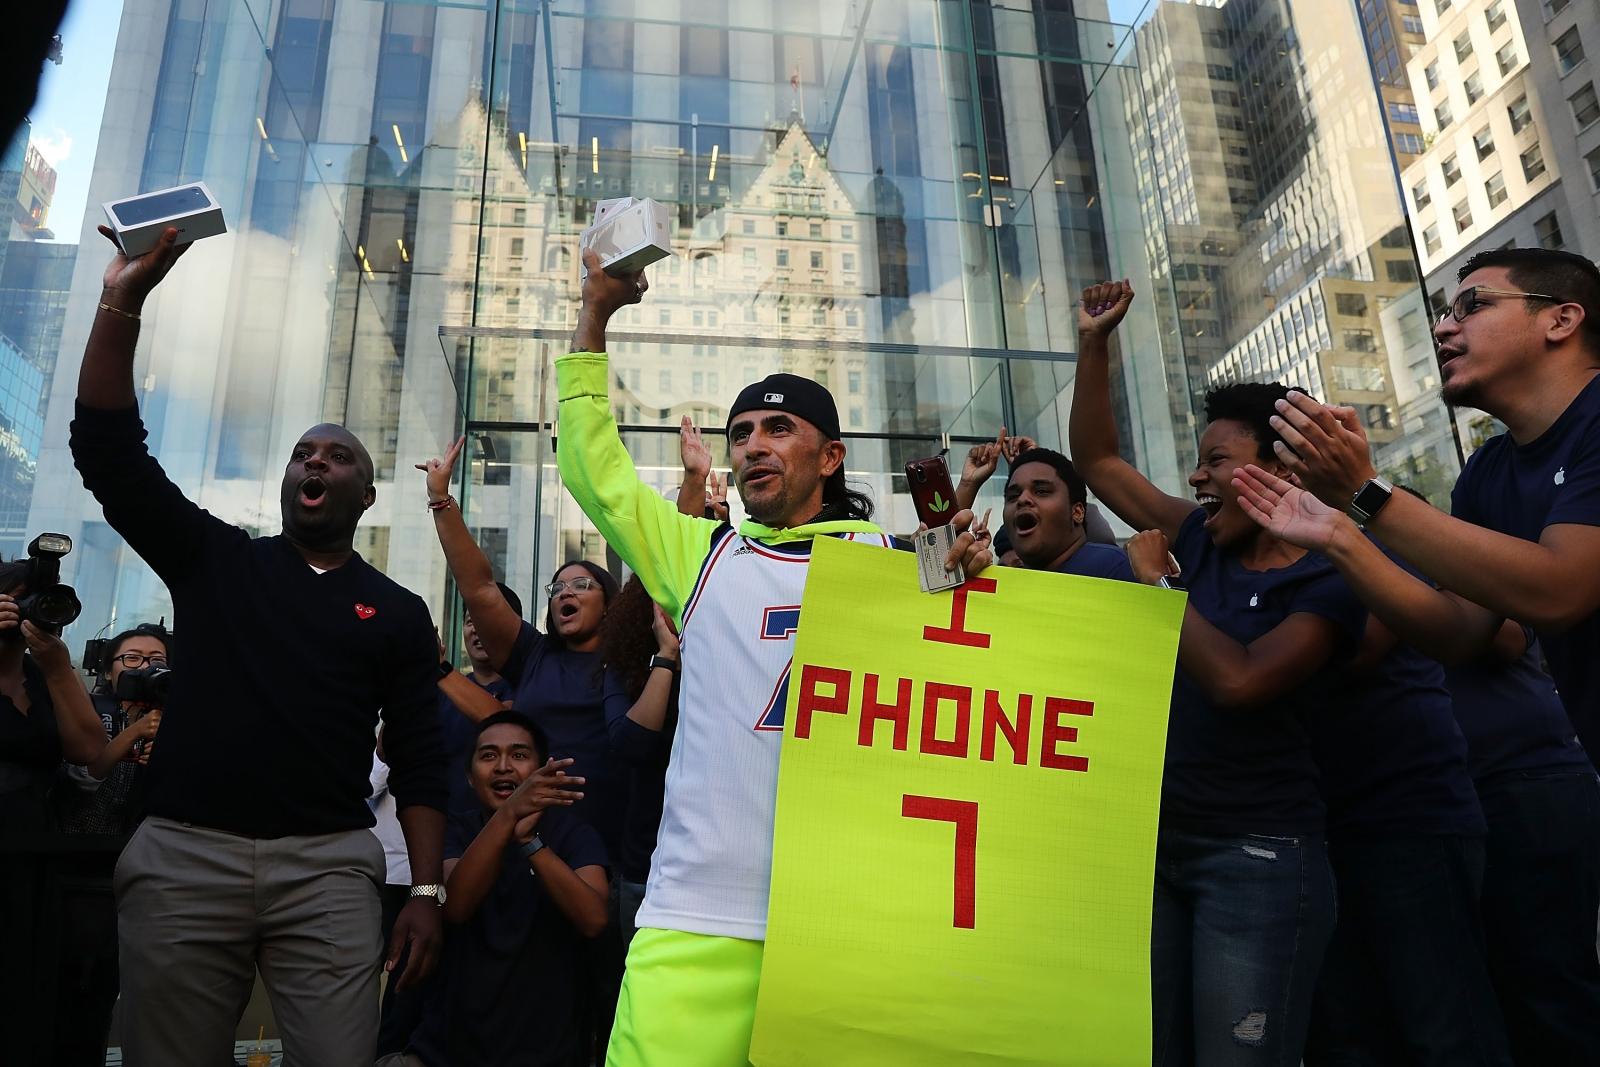 iPhone 7 Plus caught fire